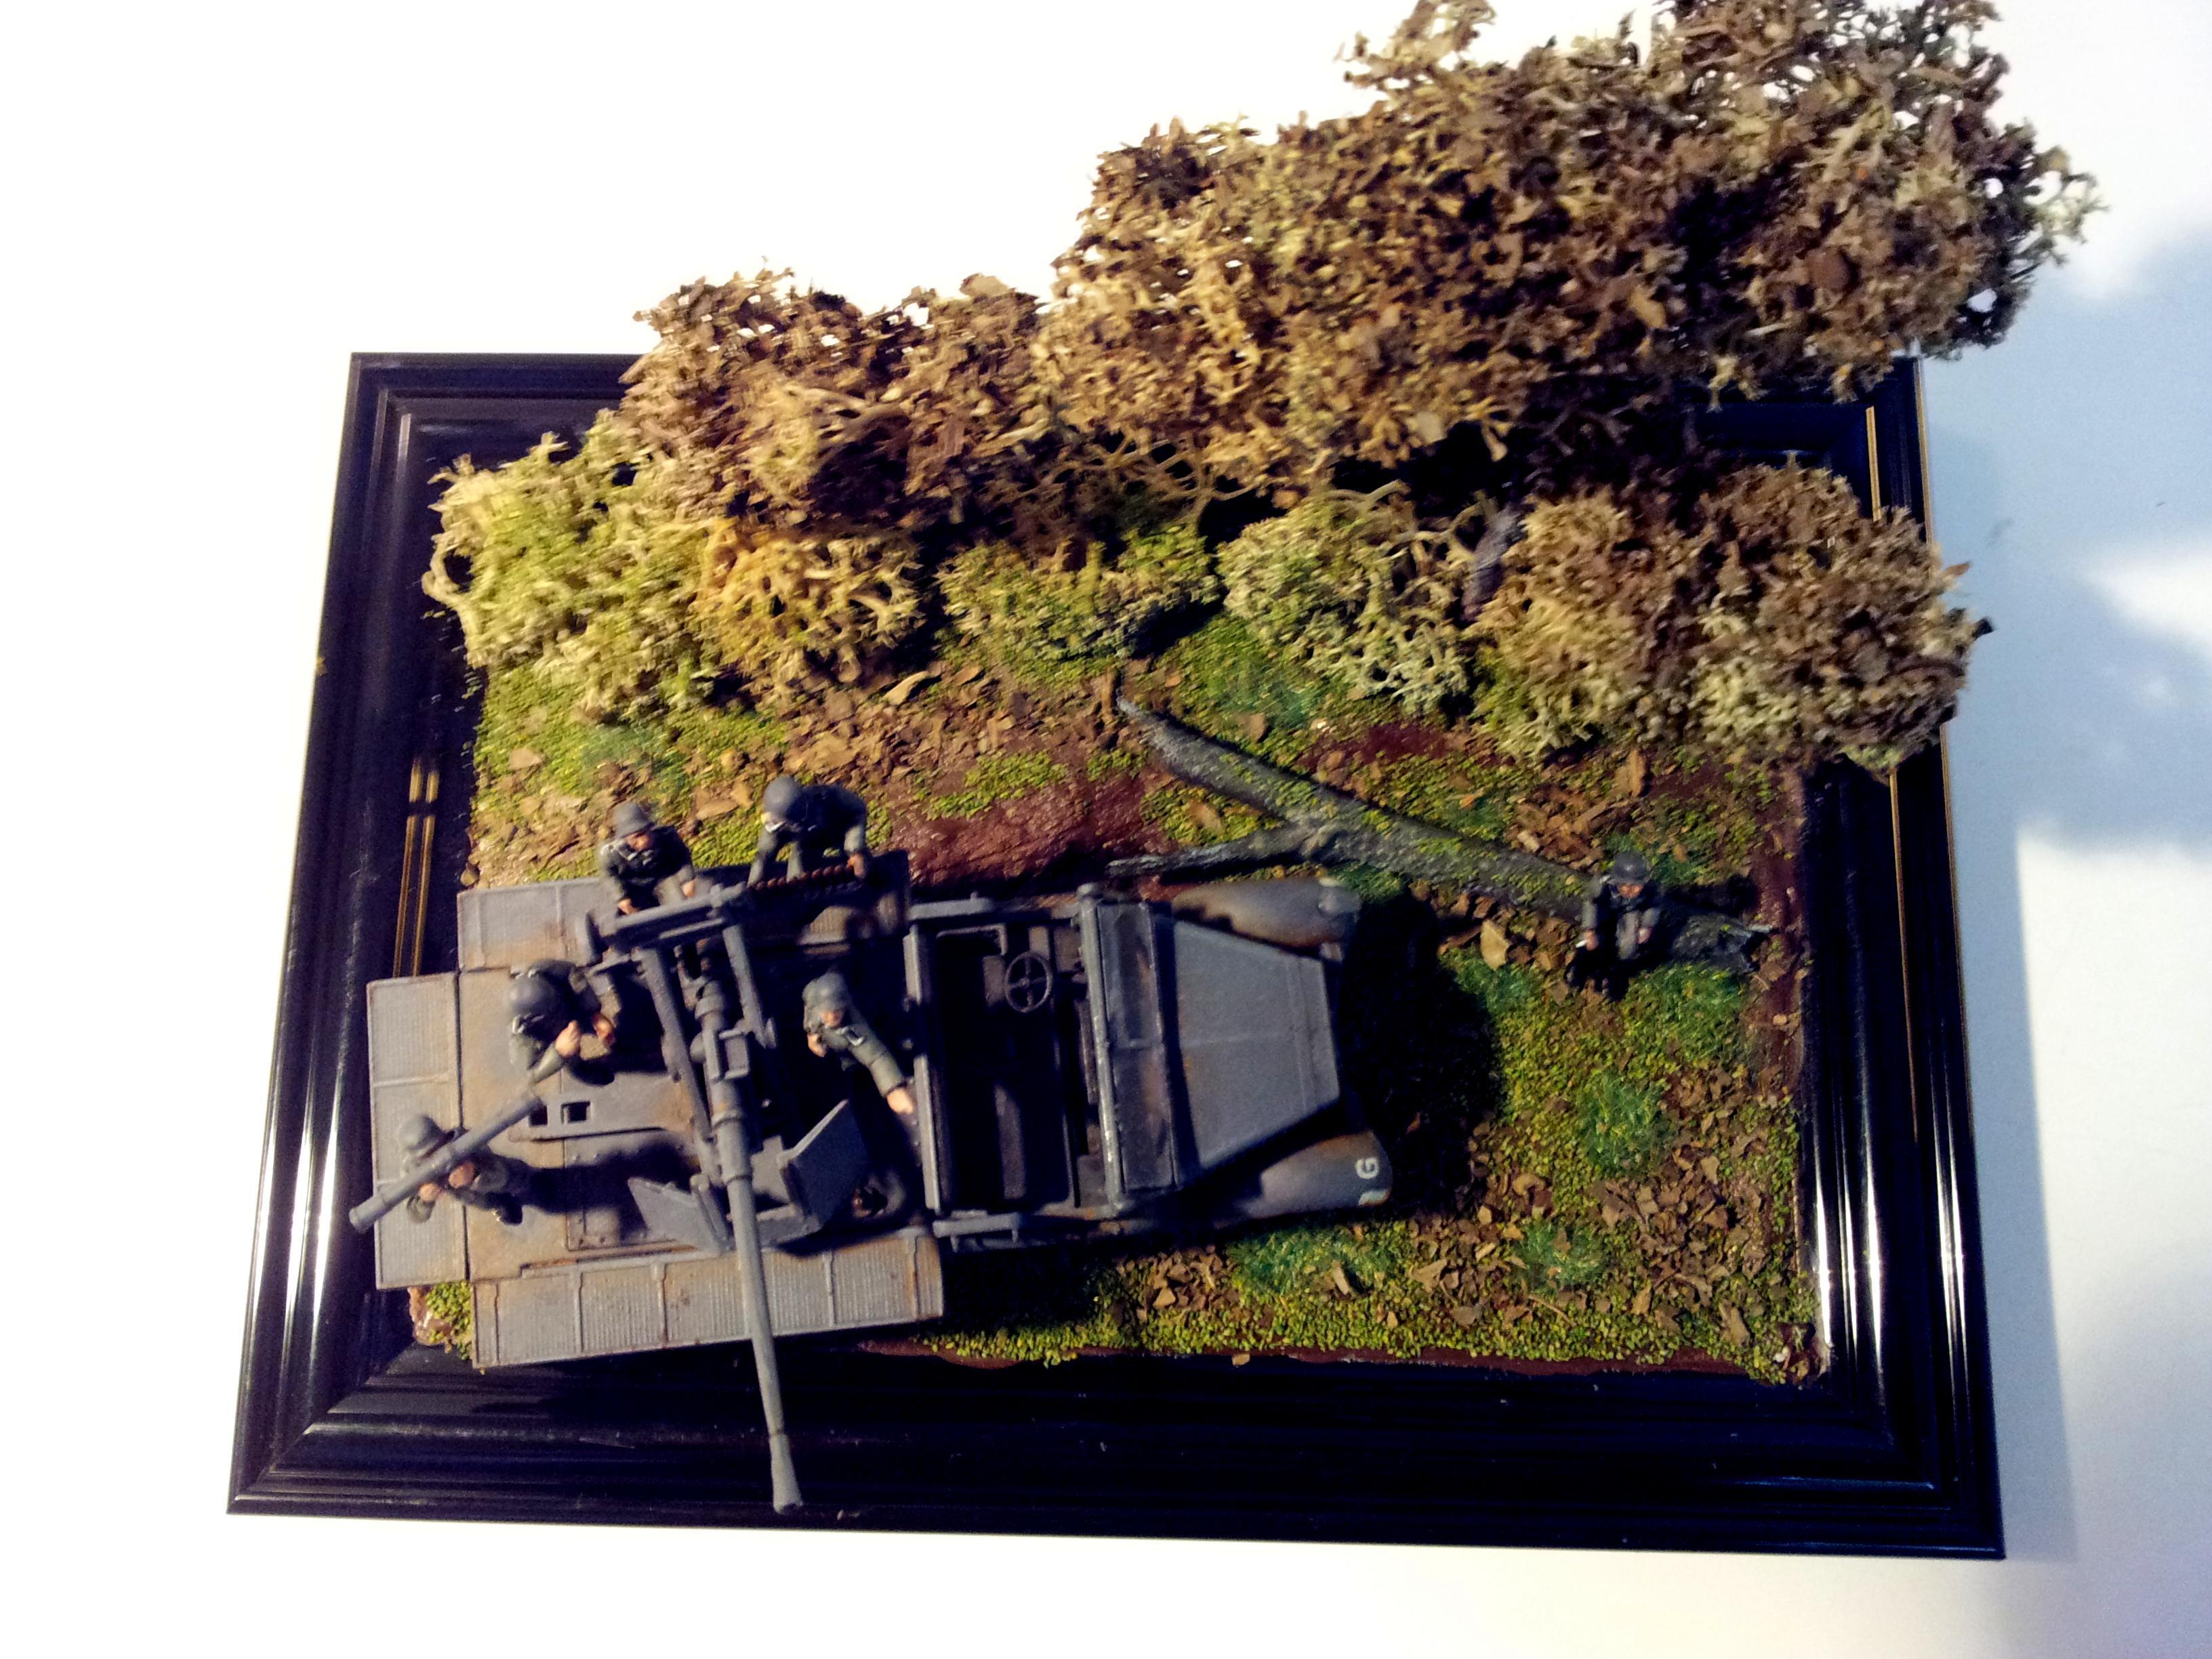 1/72, 1:72, Diorama, Germans, Sdkfz 7, World War 2